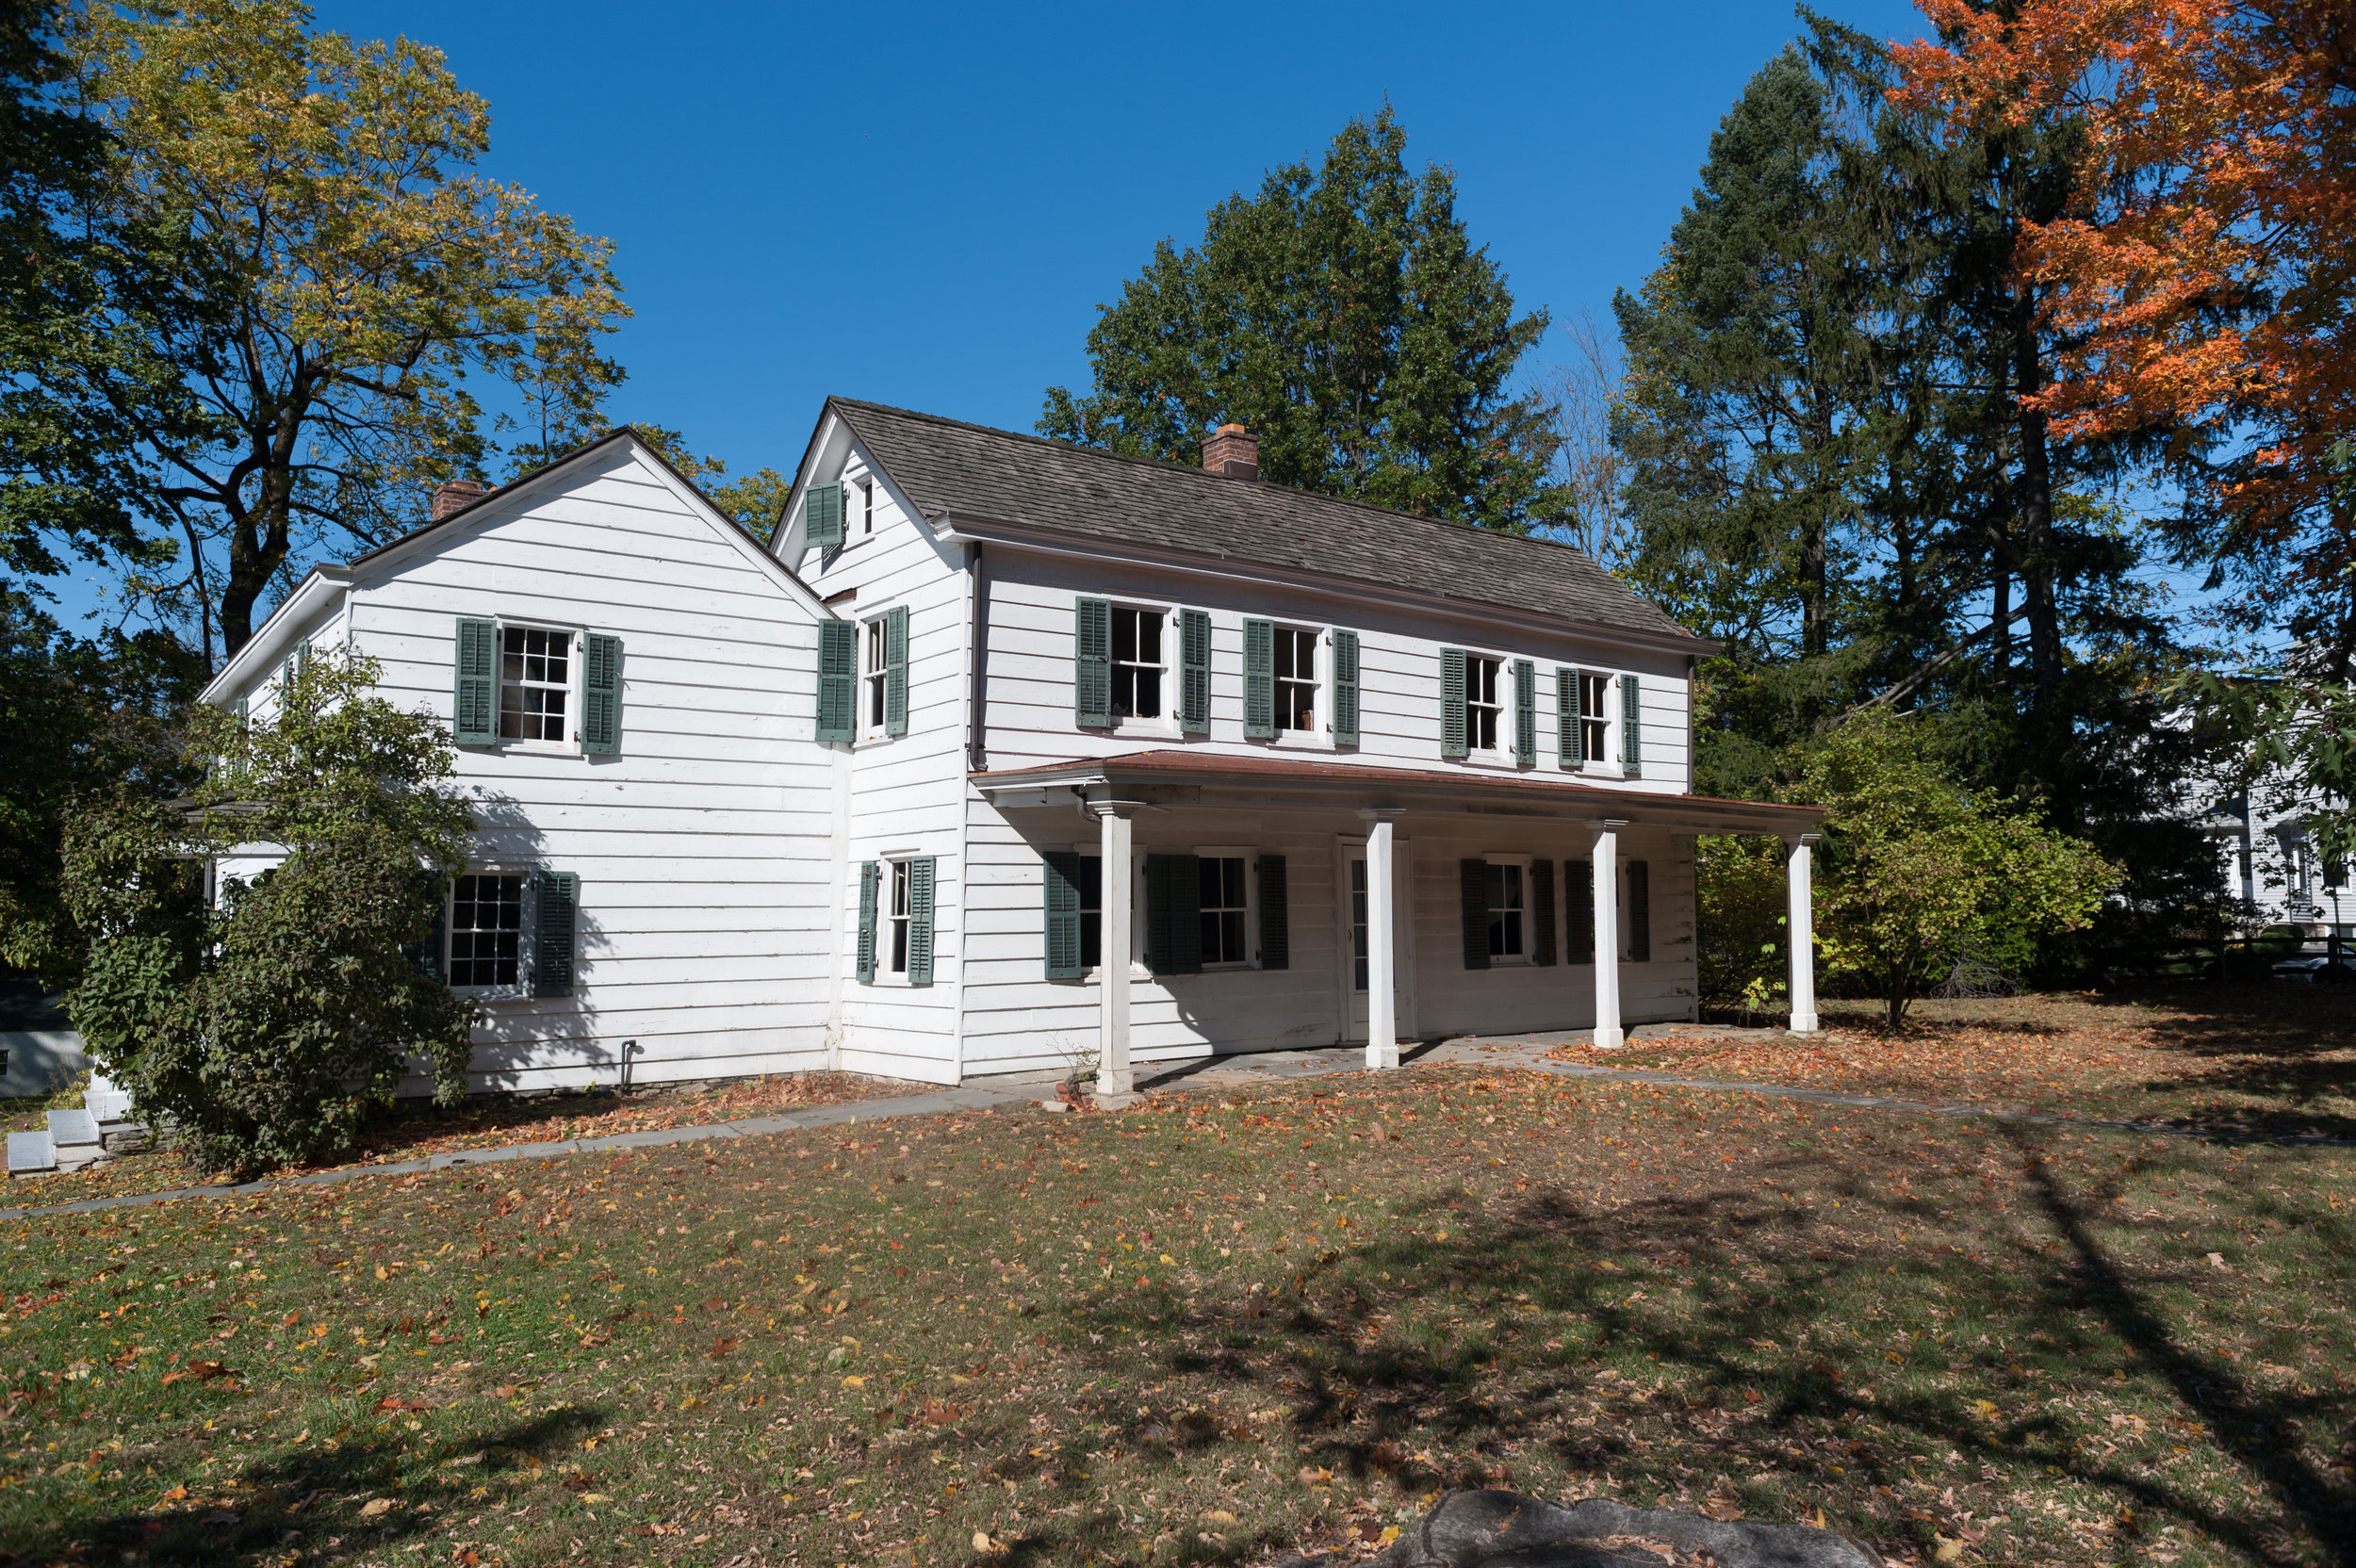 The Cudner-Hyatt house,one of Scarsdale's earliest pre-Revolutionary farmhouses.